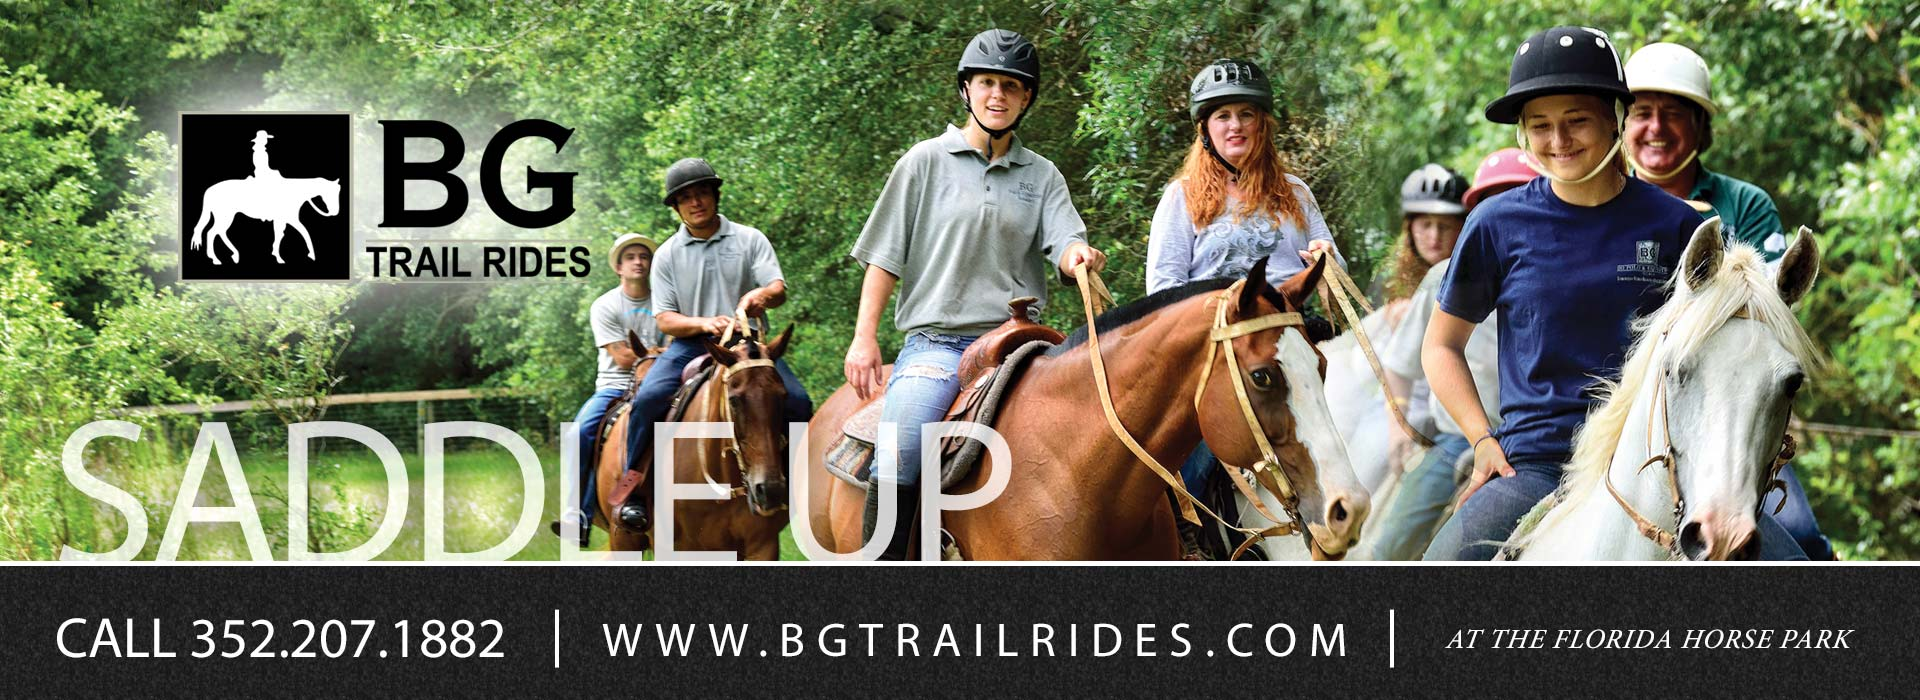 BG Trail Rides